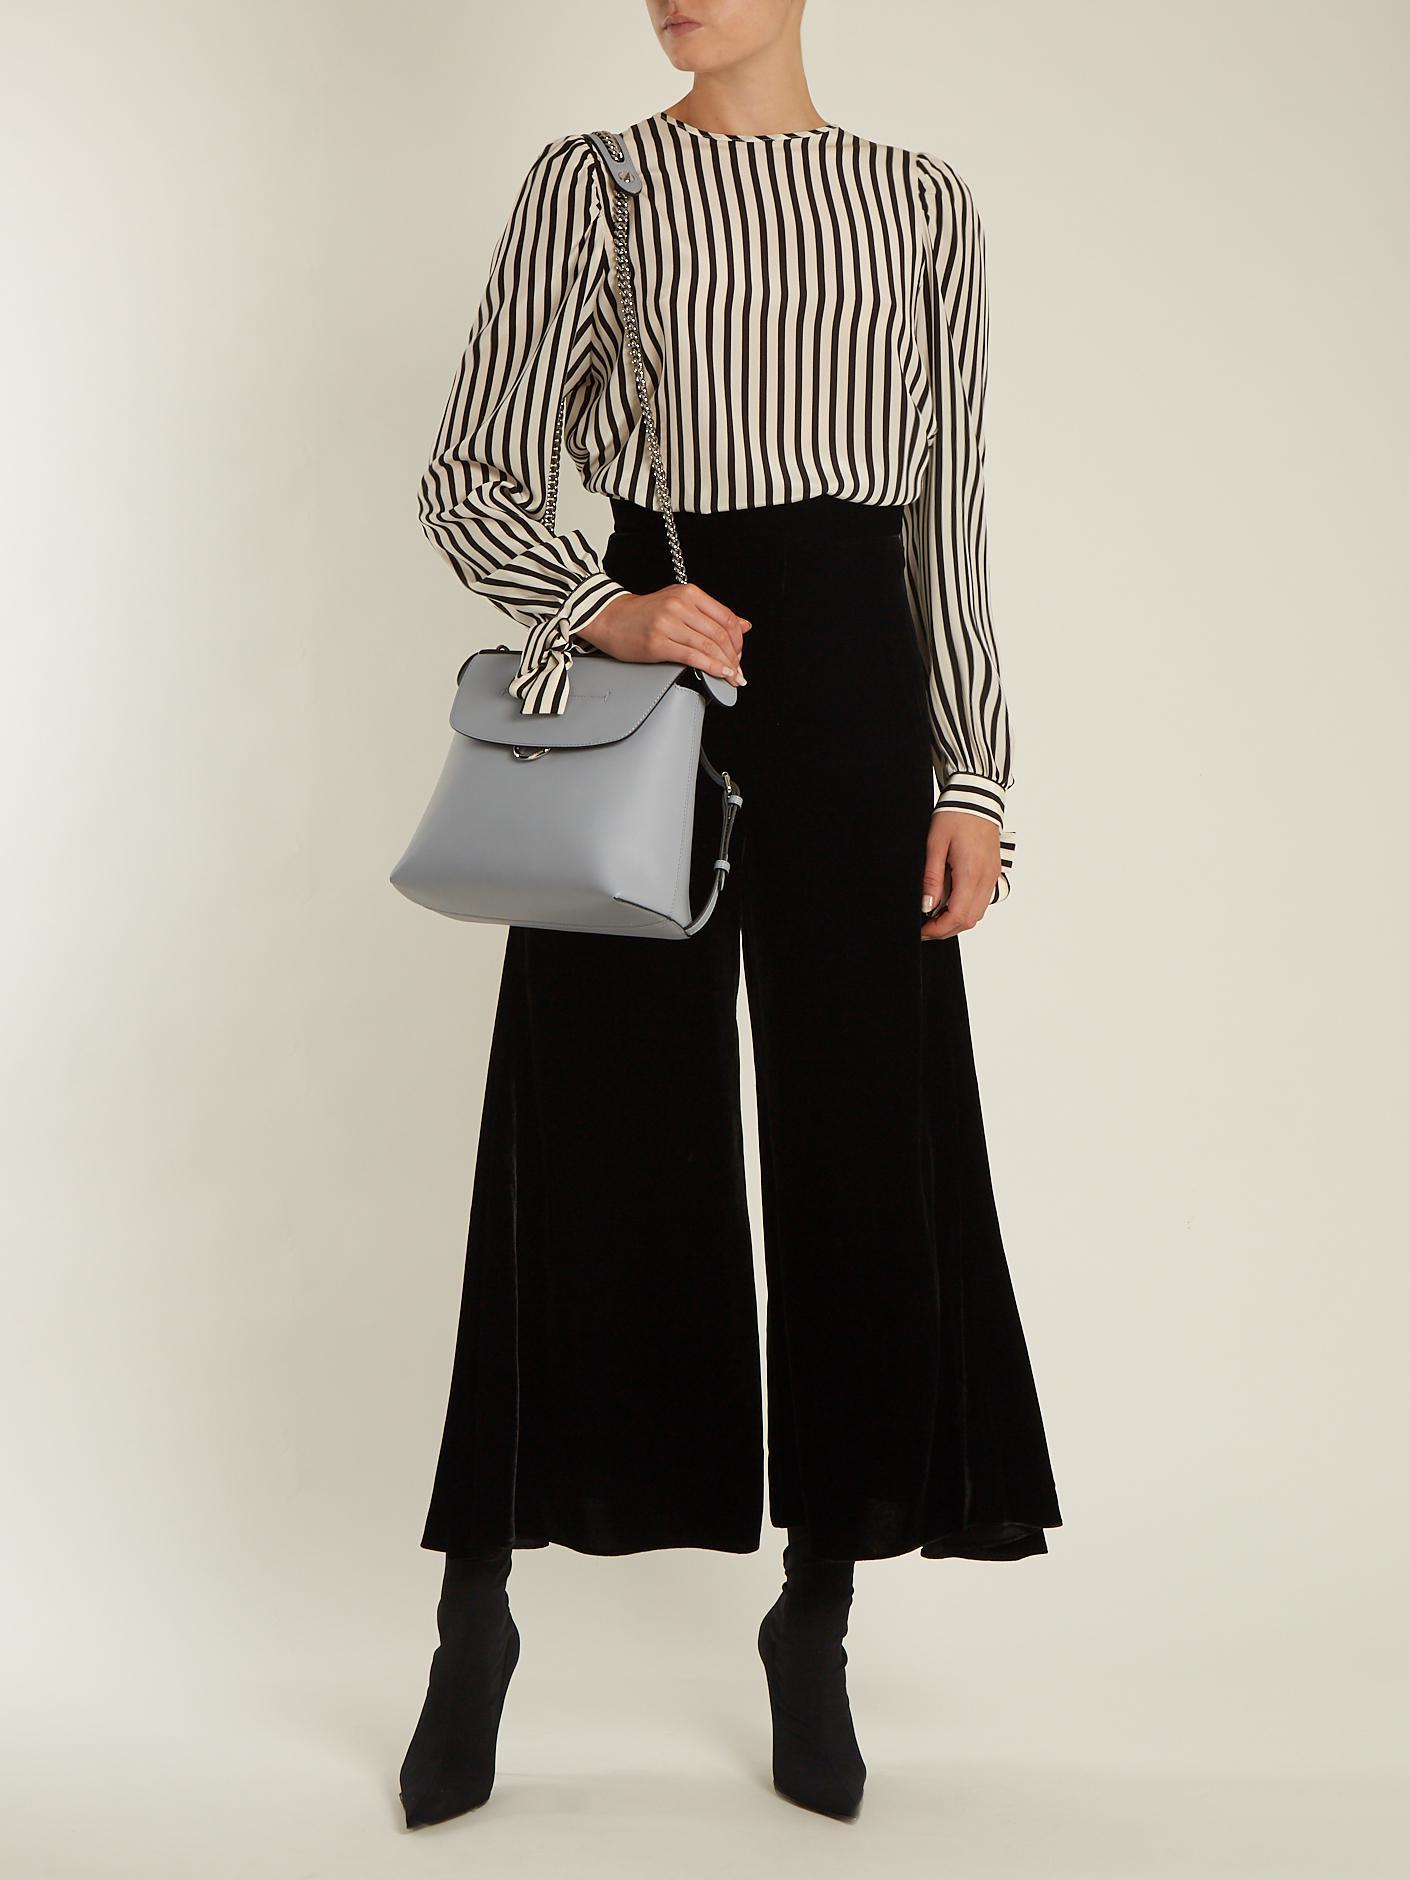 28770b55d9fd Fendi Back To School Mini Leather Backpack in Gray - Lyst